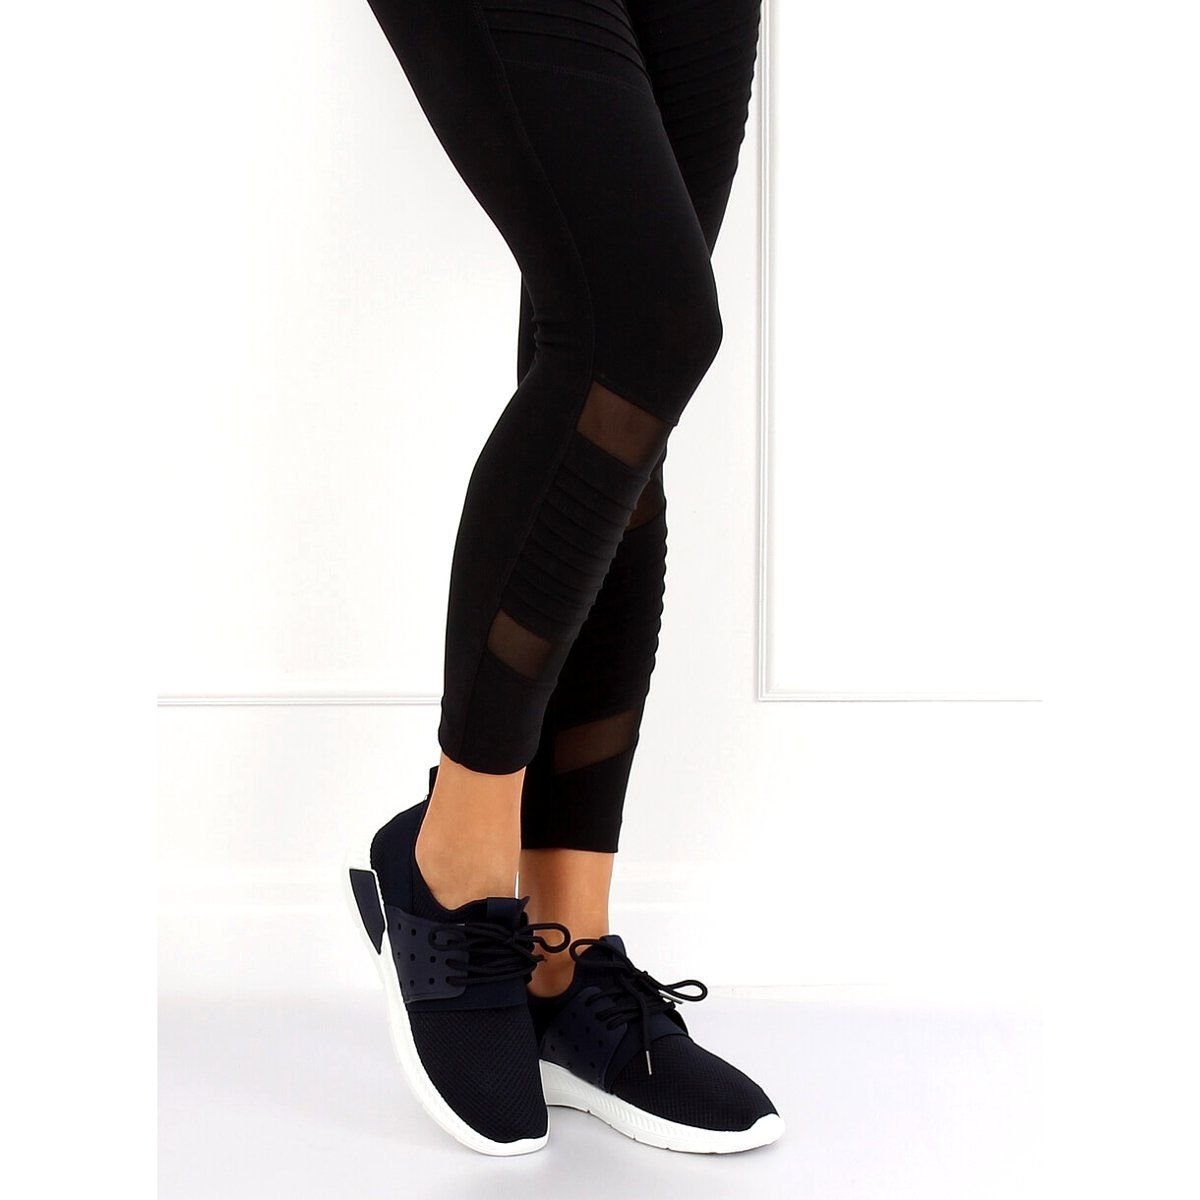 Buty Sportowe Granatowe 7781 Y Blue Fashion Black Jeans Black